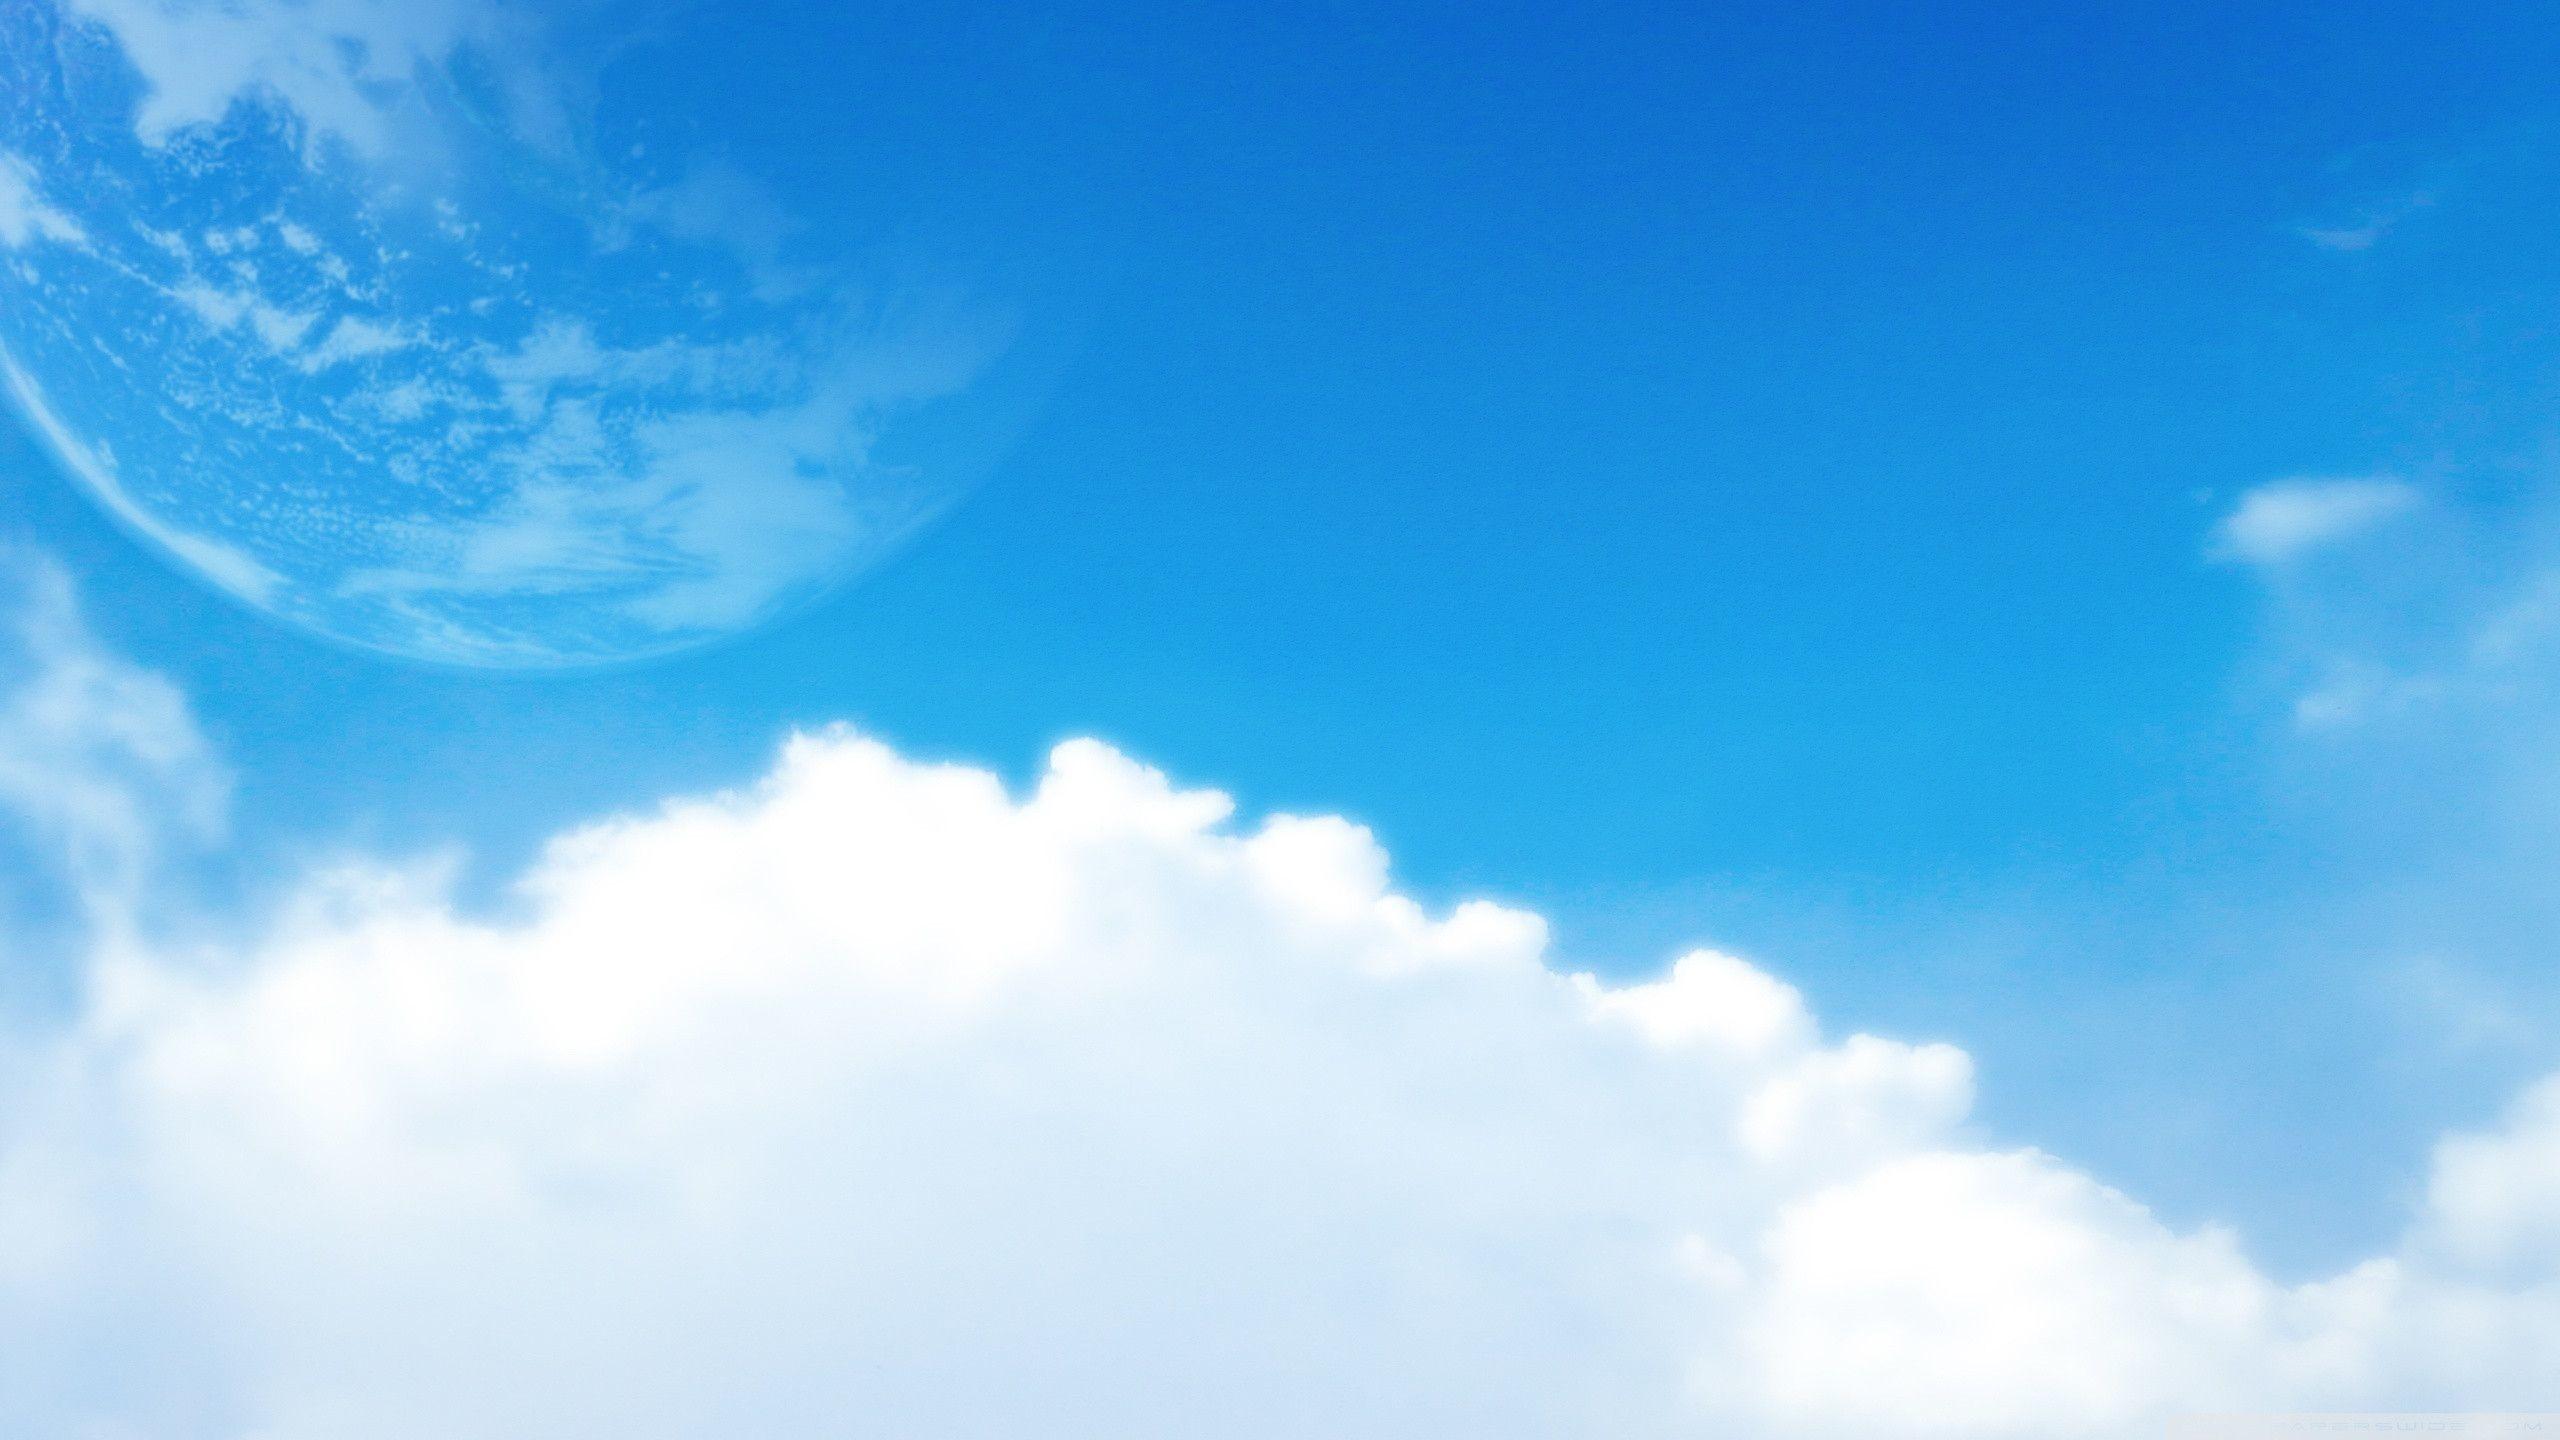 nature snow sky HD Wallpaper | ololoshenka | Pinterest | Sky hd, Hd  wallpaper and Snow